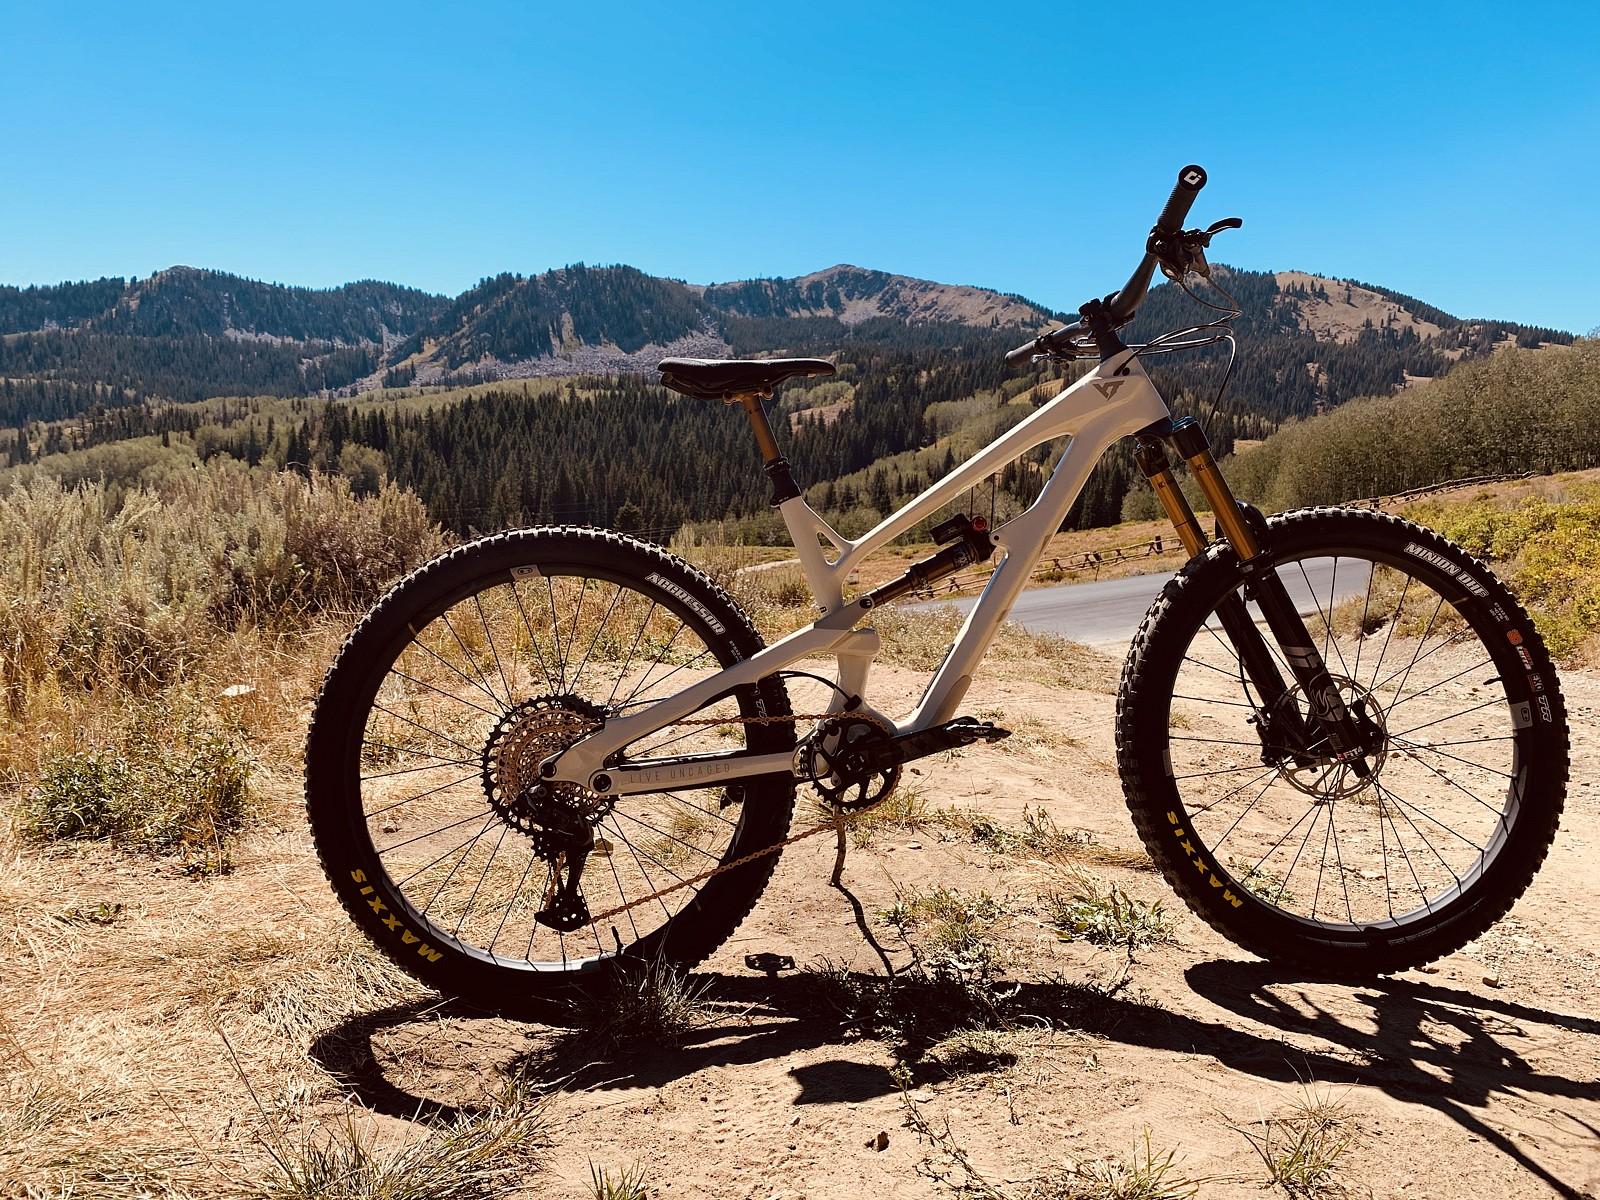 IMG E0206 - jaykalafatis - Mountain Biking Pictures - Vital MTB